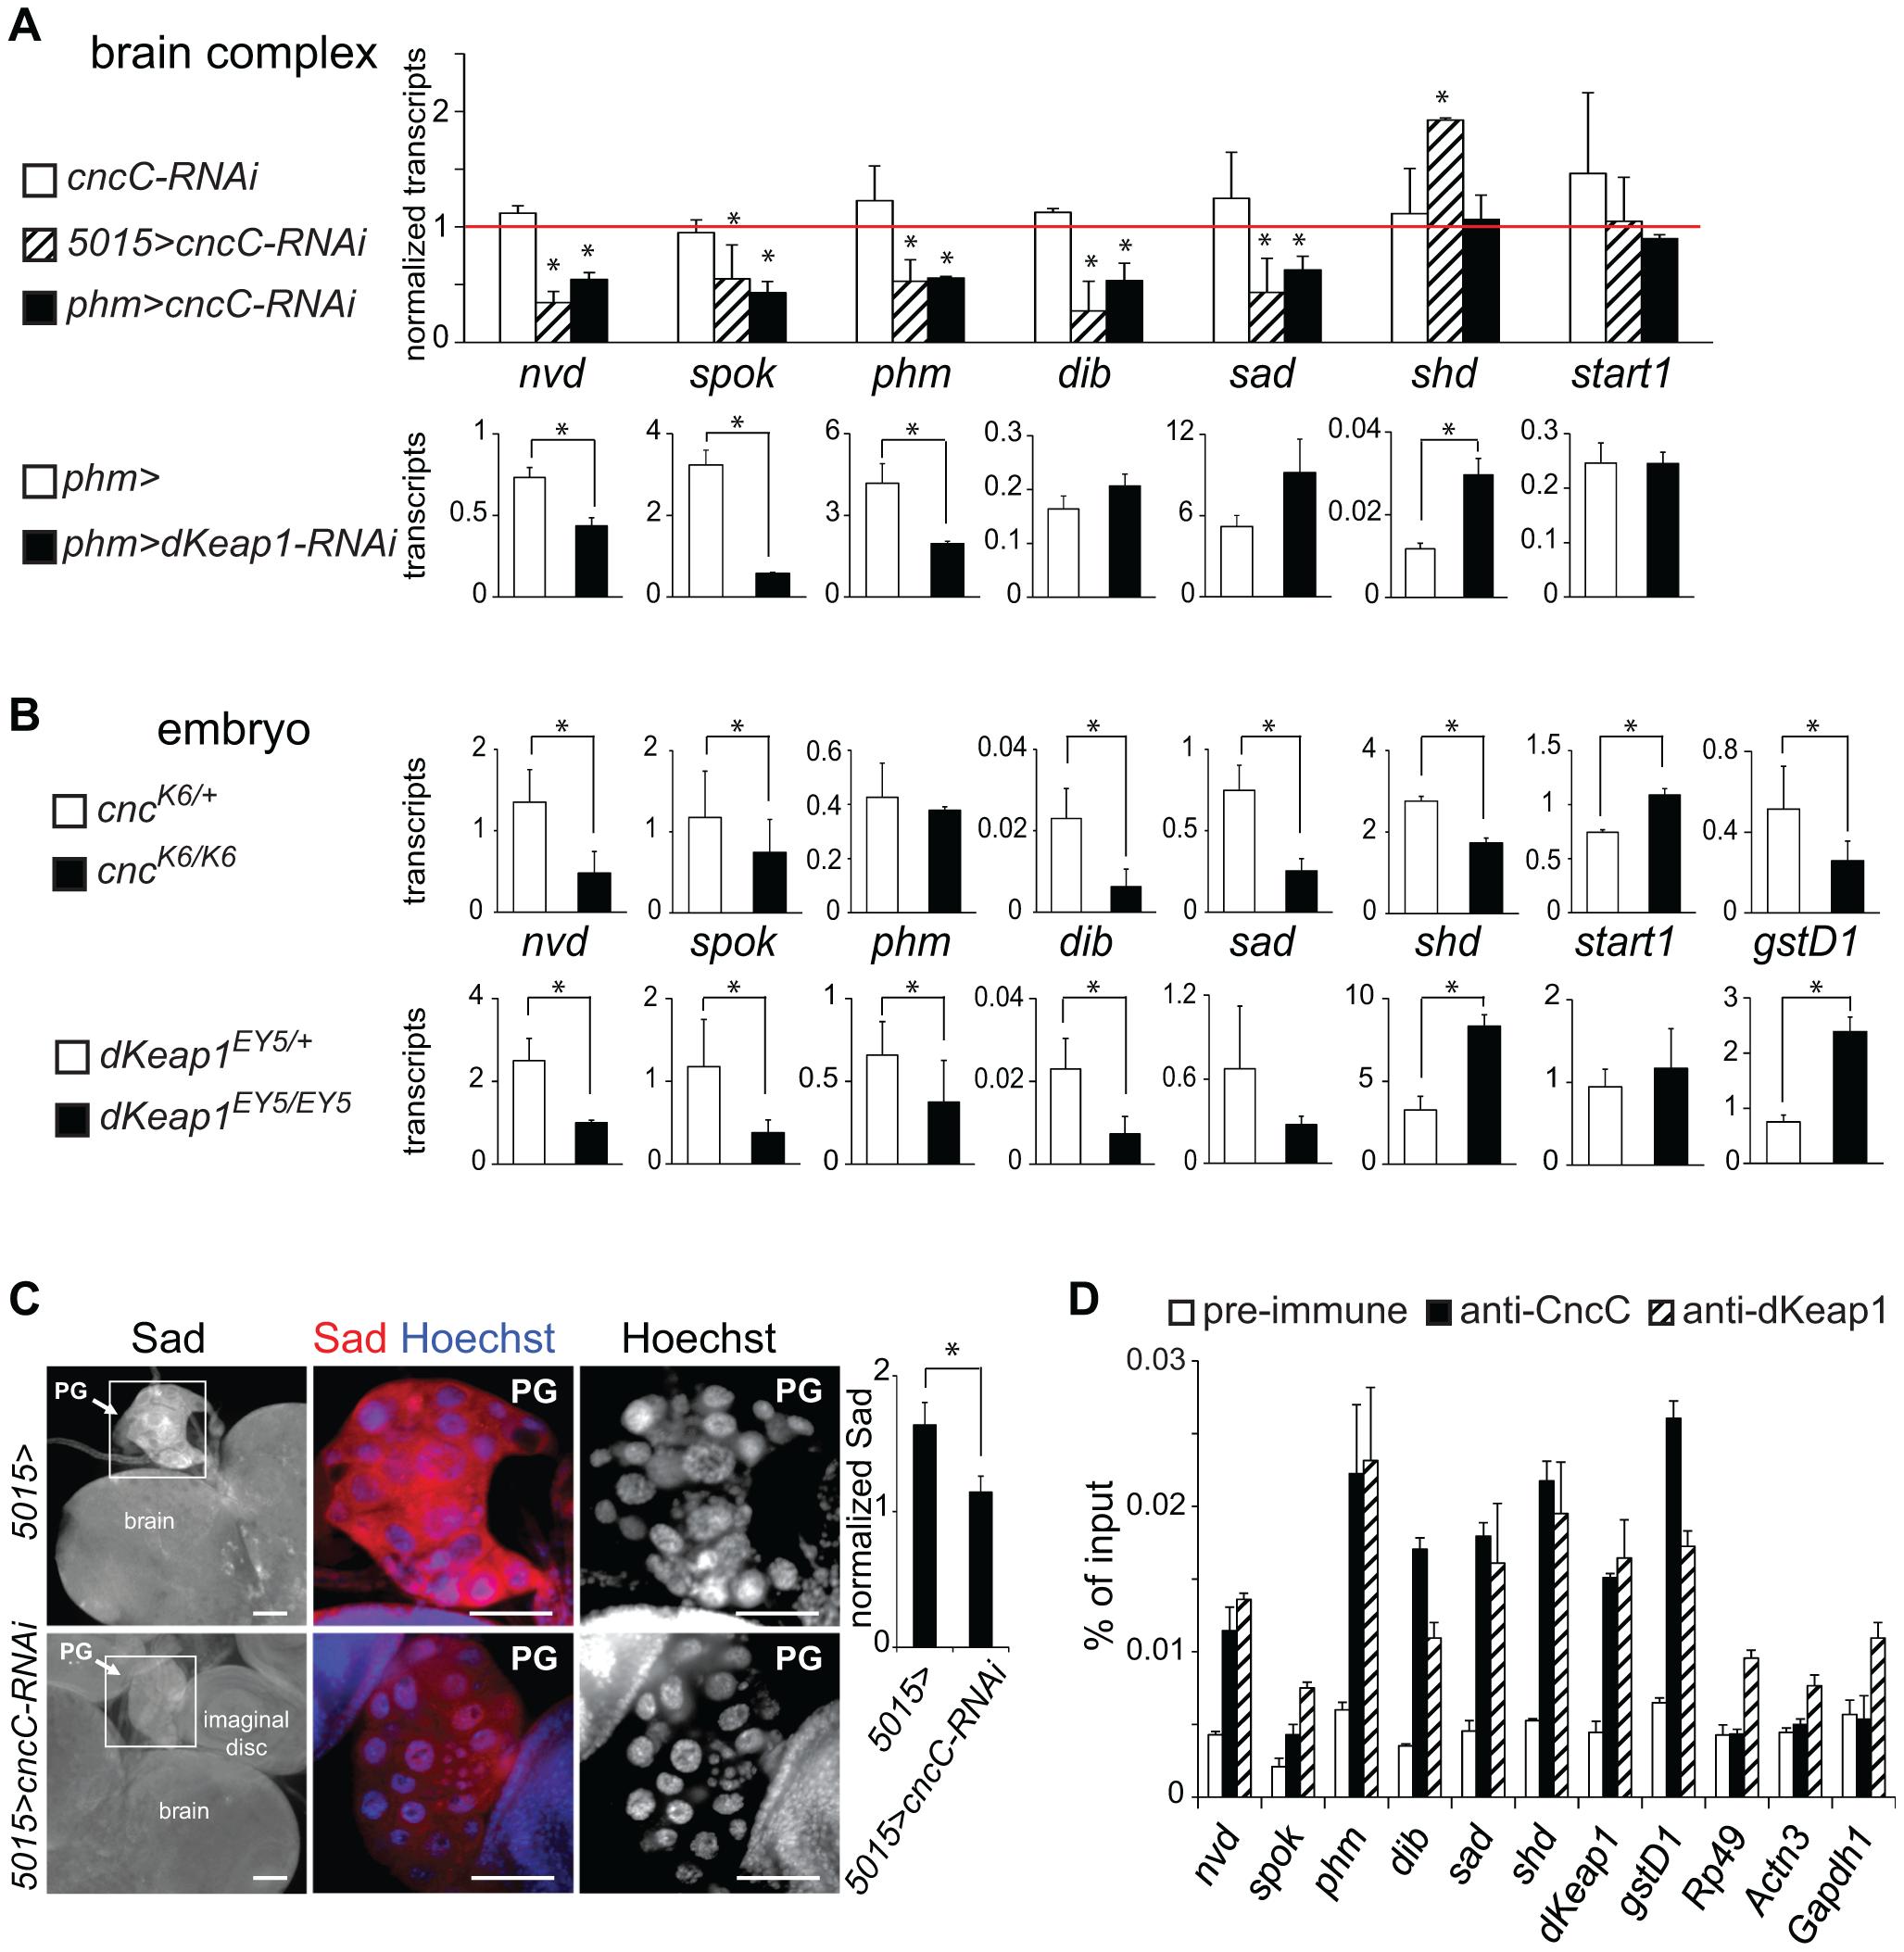 Regulation of ecdysone biosynthetic gene transcription by CncC and dKeap1.